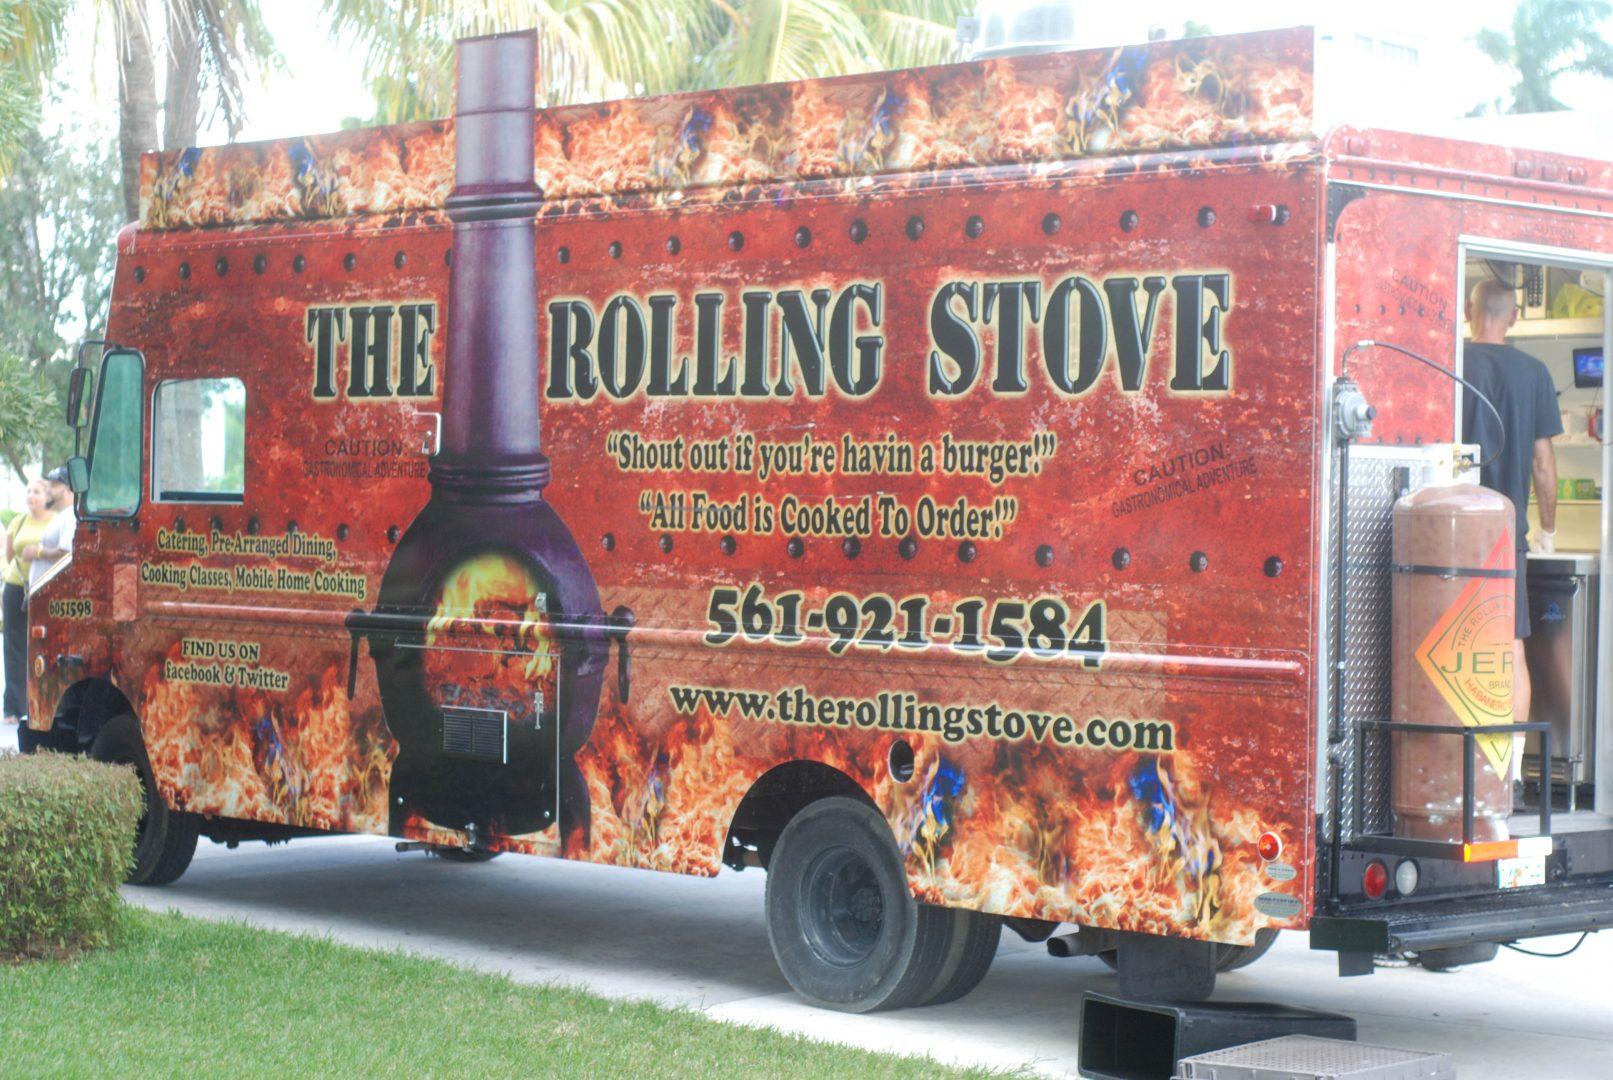 The 21 Best Miami, FL Food Trucks - 2019 - Roaming Hunger